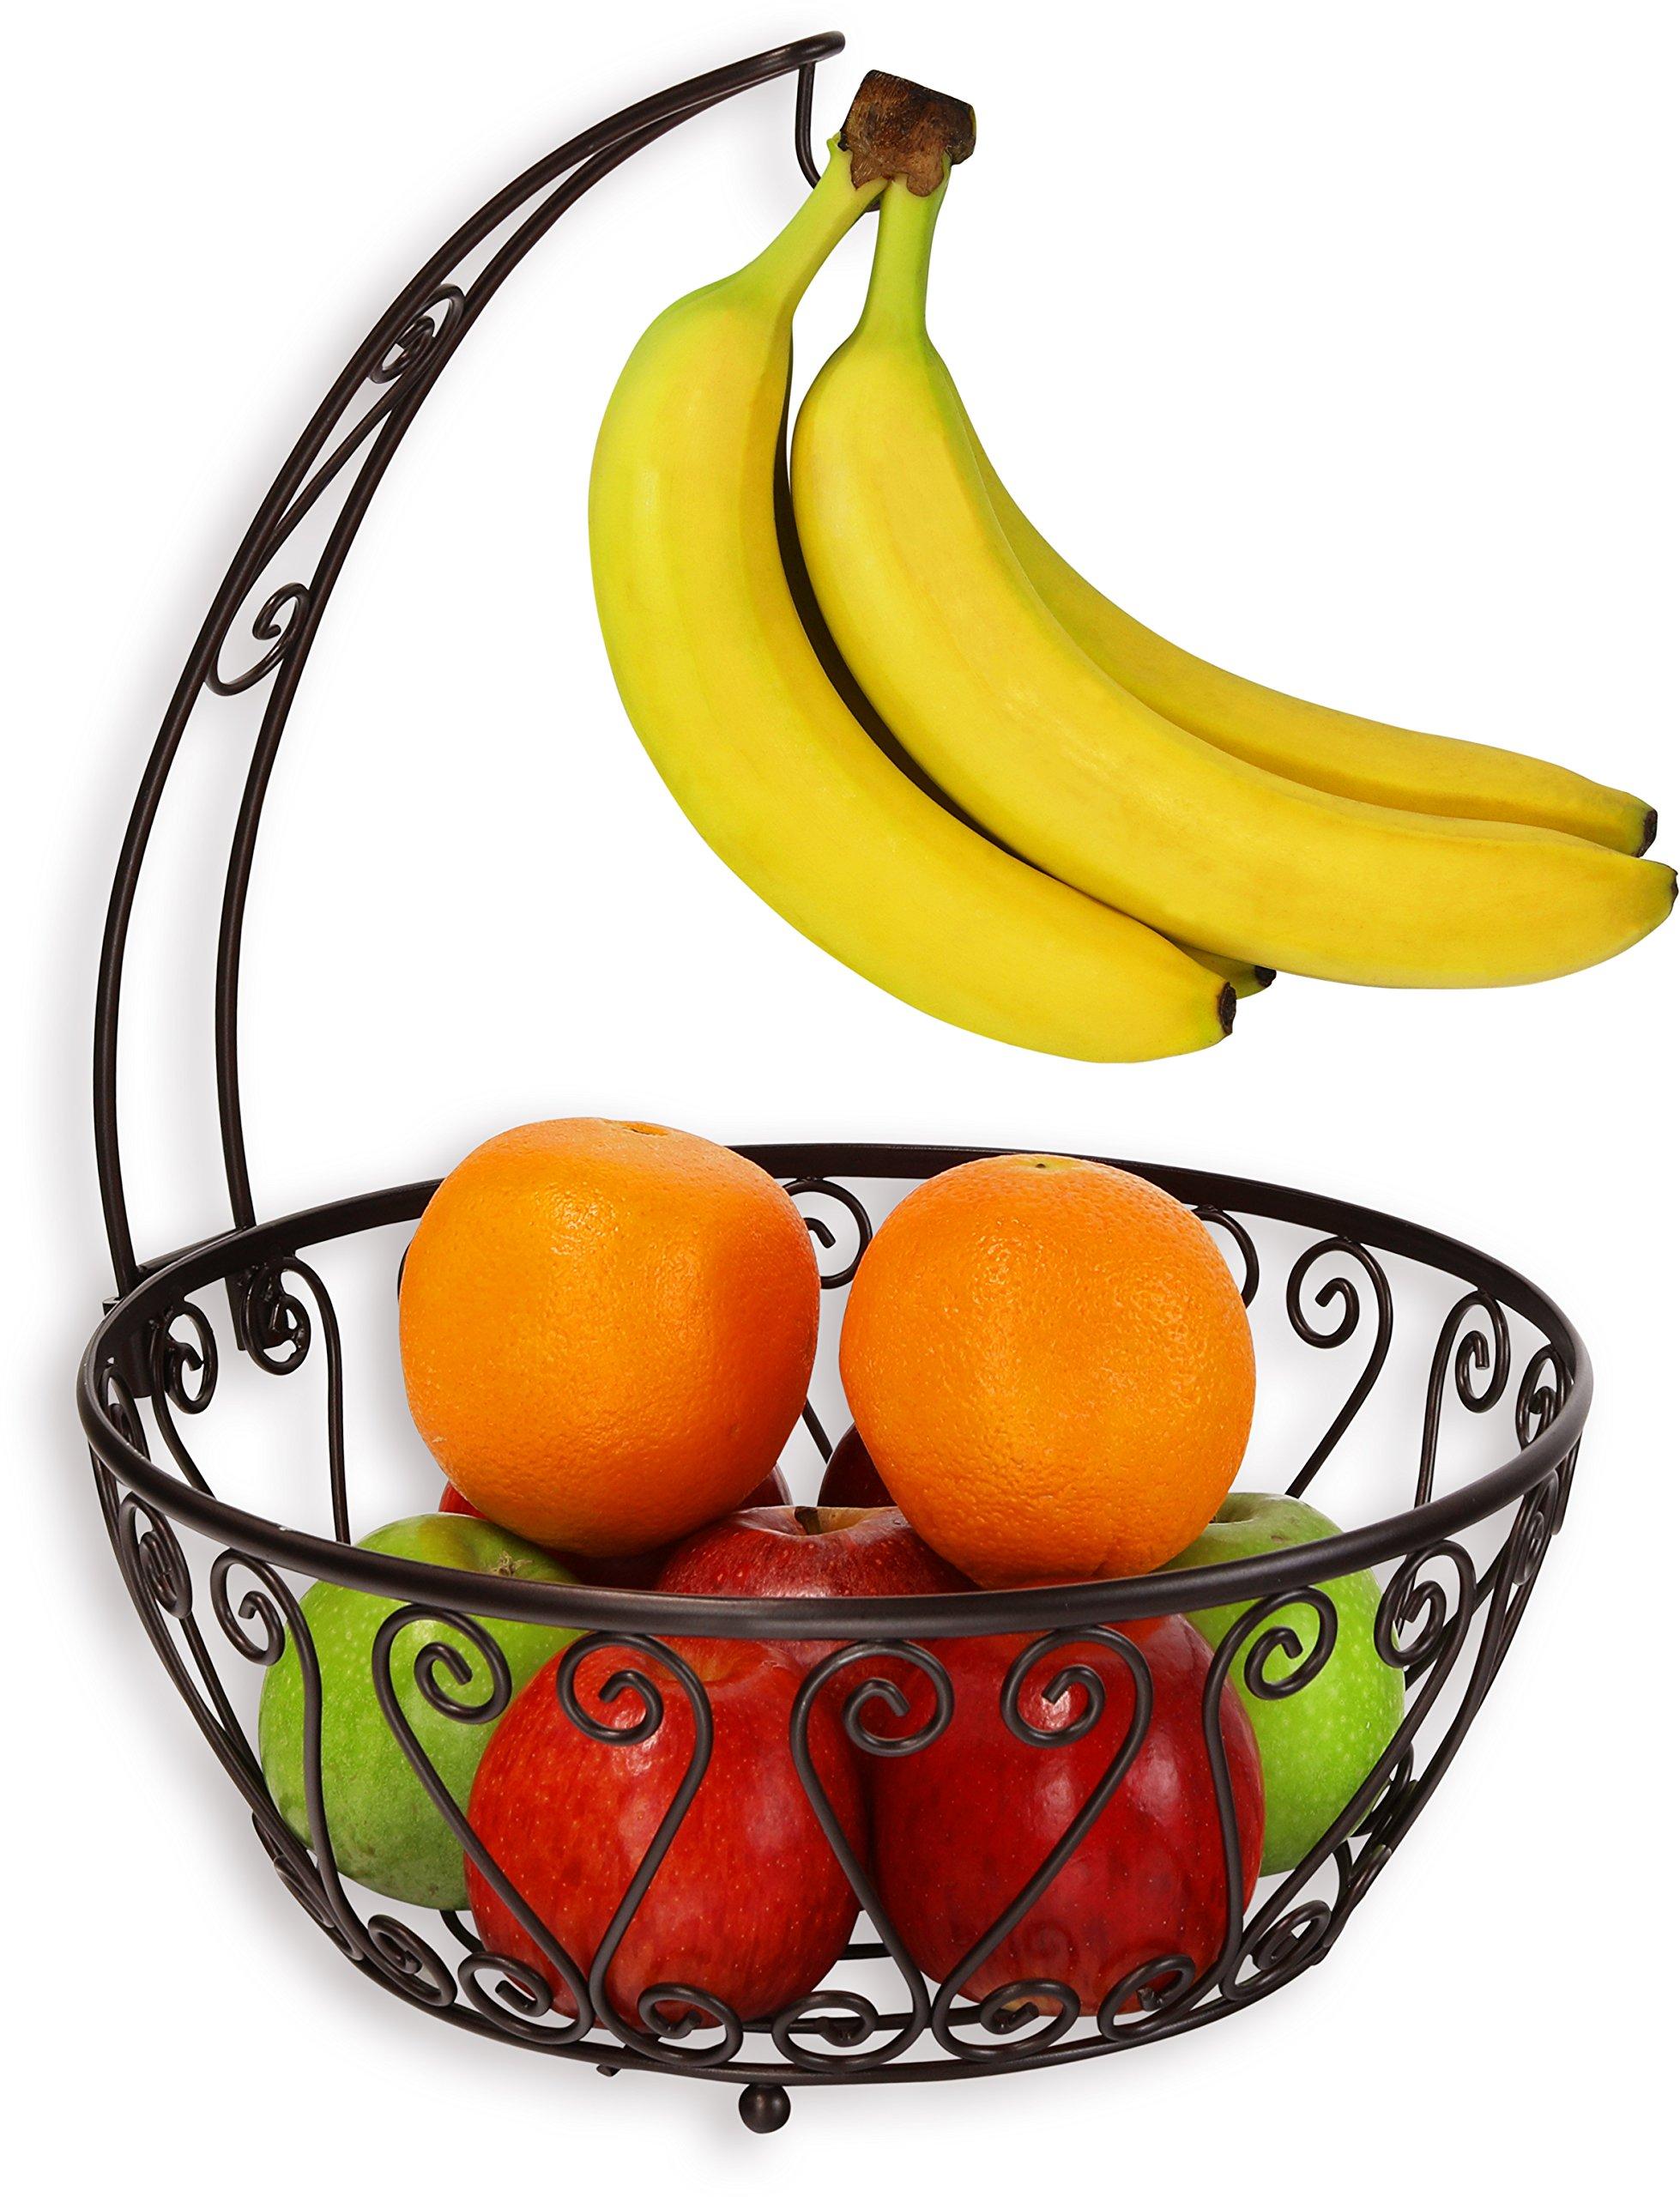 SimpleHouseware Fruit Basket Bowl with Banana Tree Hanger, Bronze by Simple Houseware